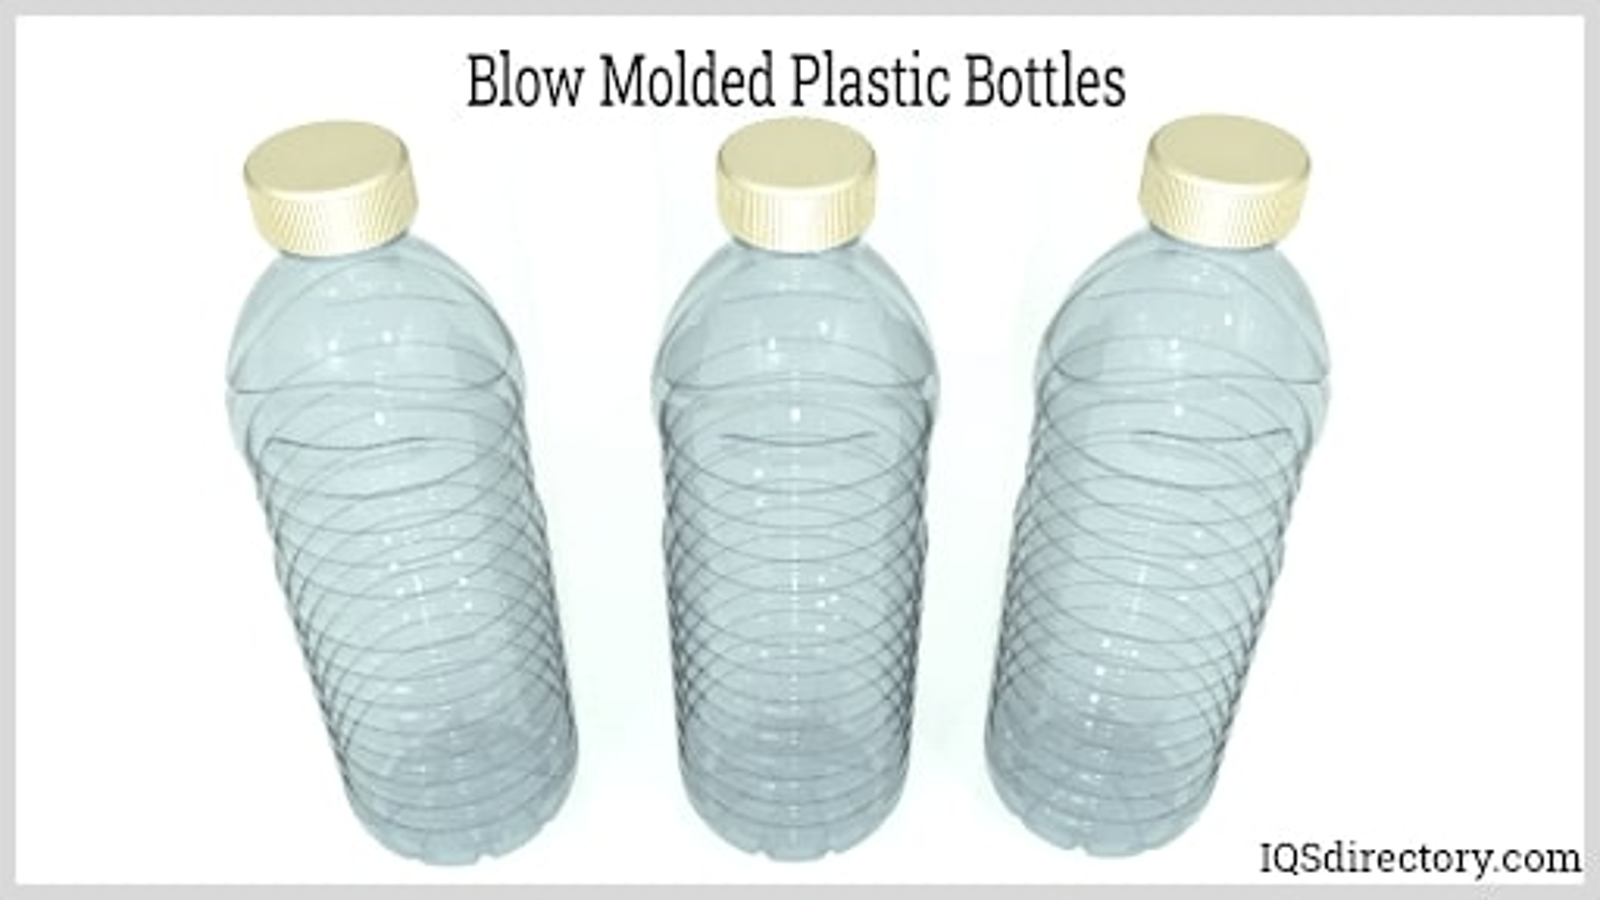 Blow Molded Plastic Bottles